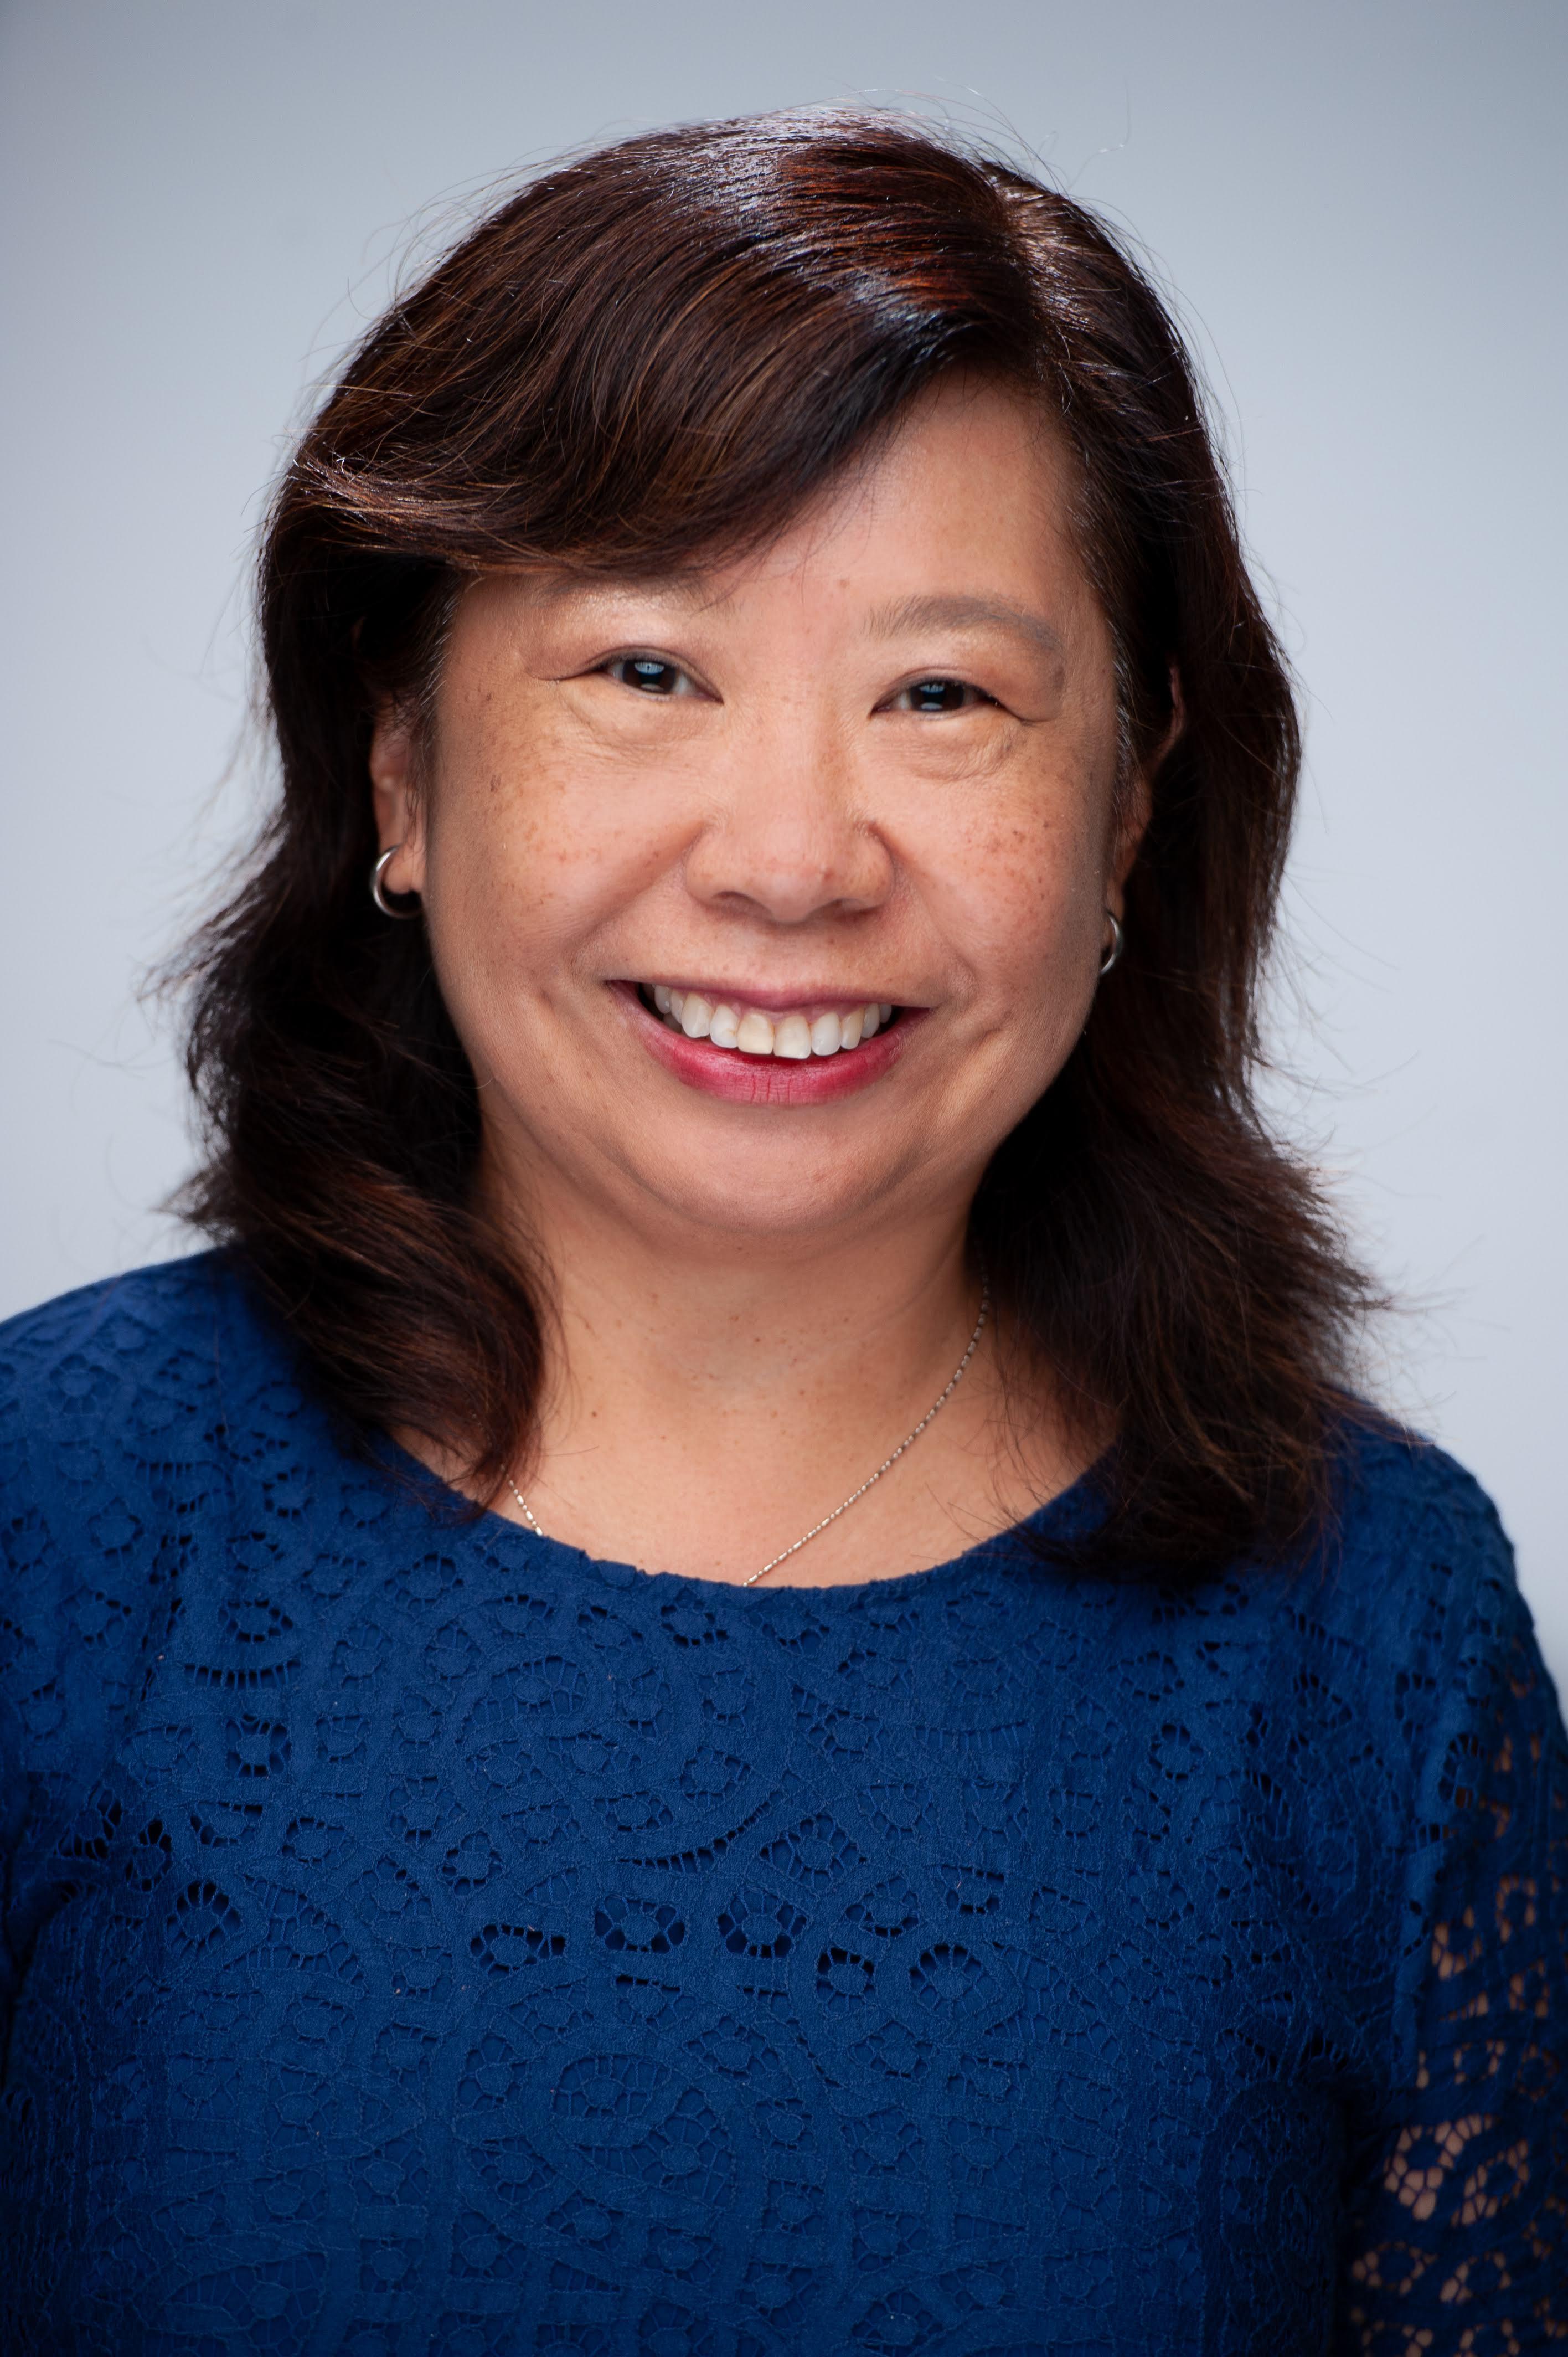 Silvia Chan